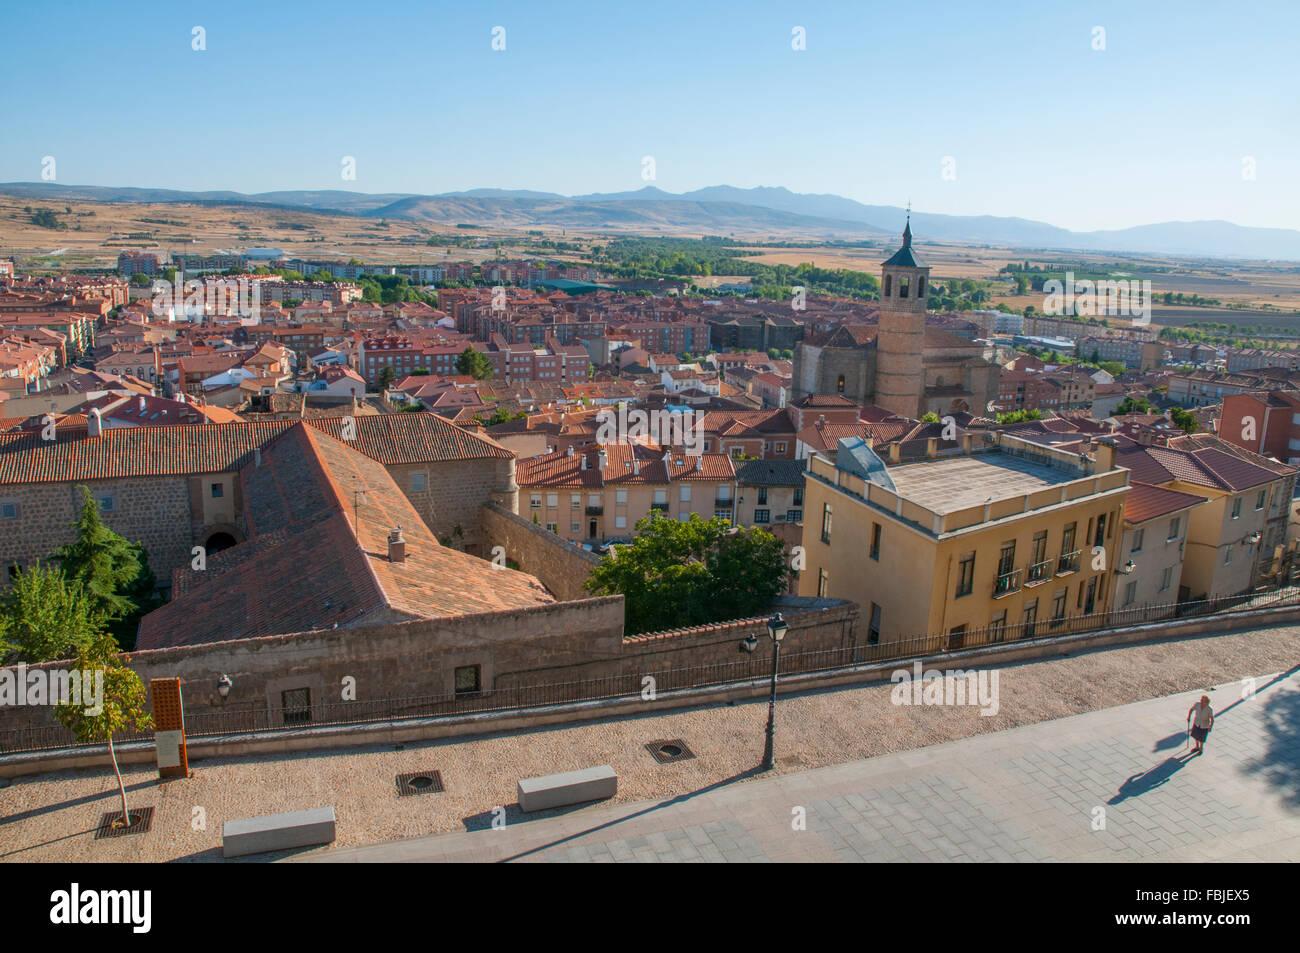 View from the city walls. Paseo del Rastro, Avila, Castilla Leon, Spain. - Stock Image